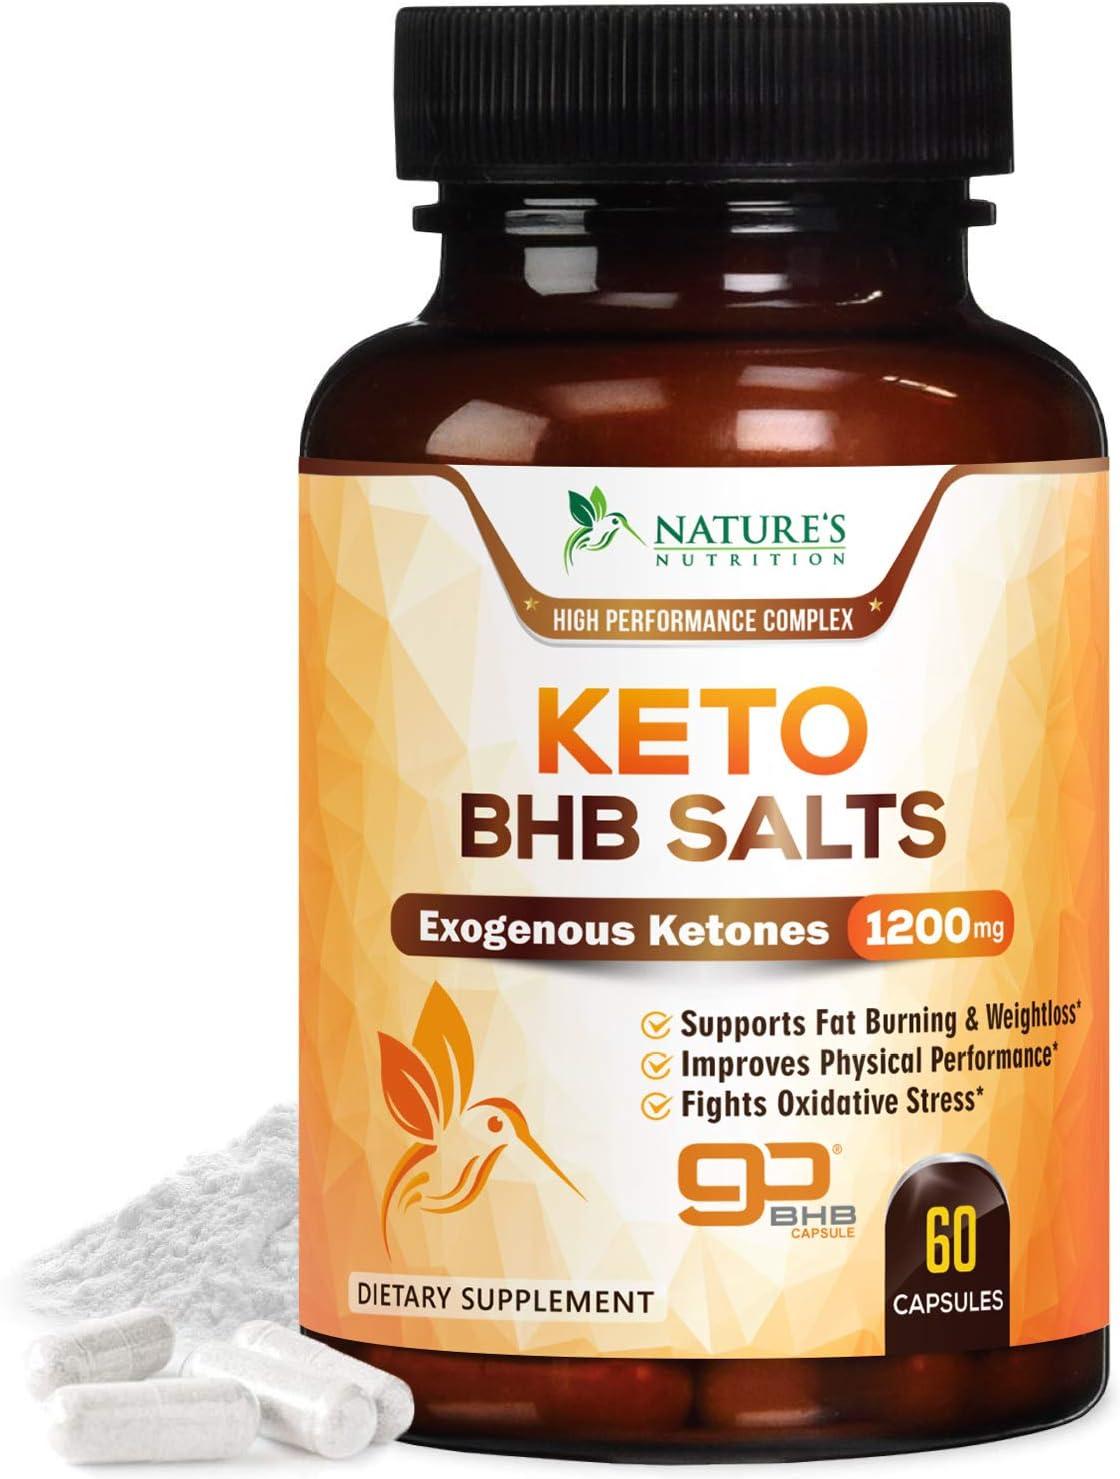 Keto BHB Pills Premium Exogenous Ketones Salts 1200mg